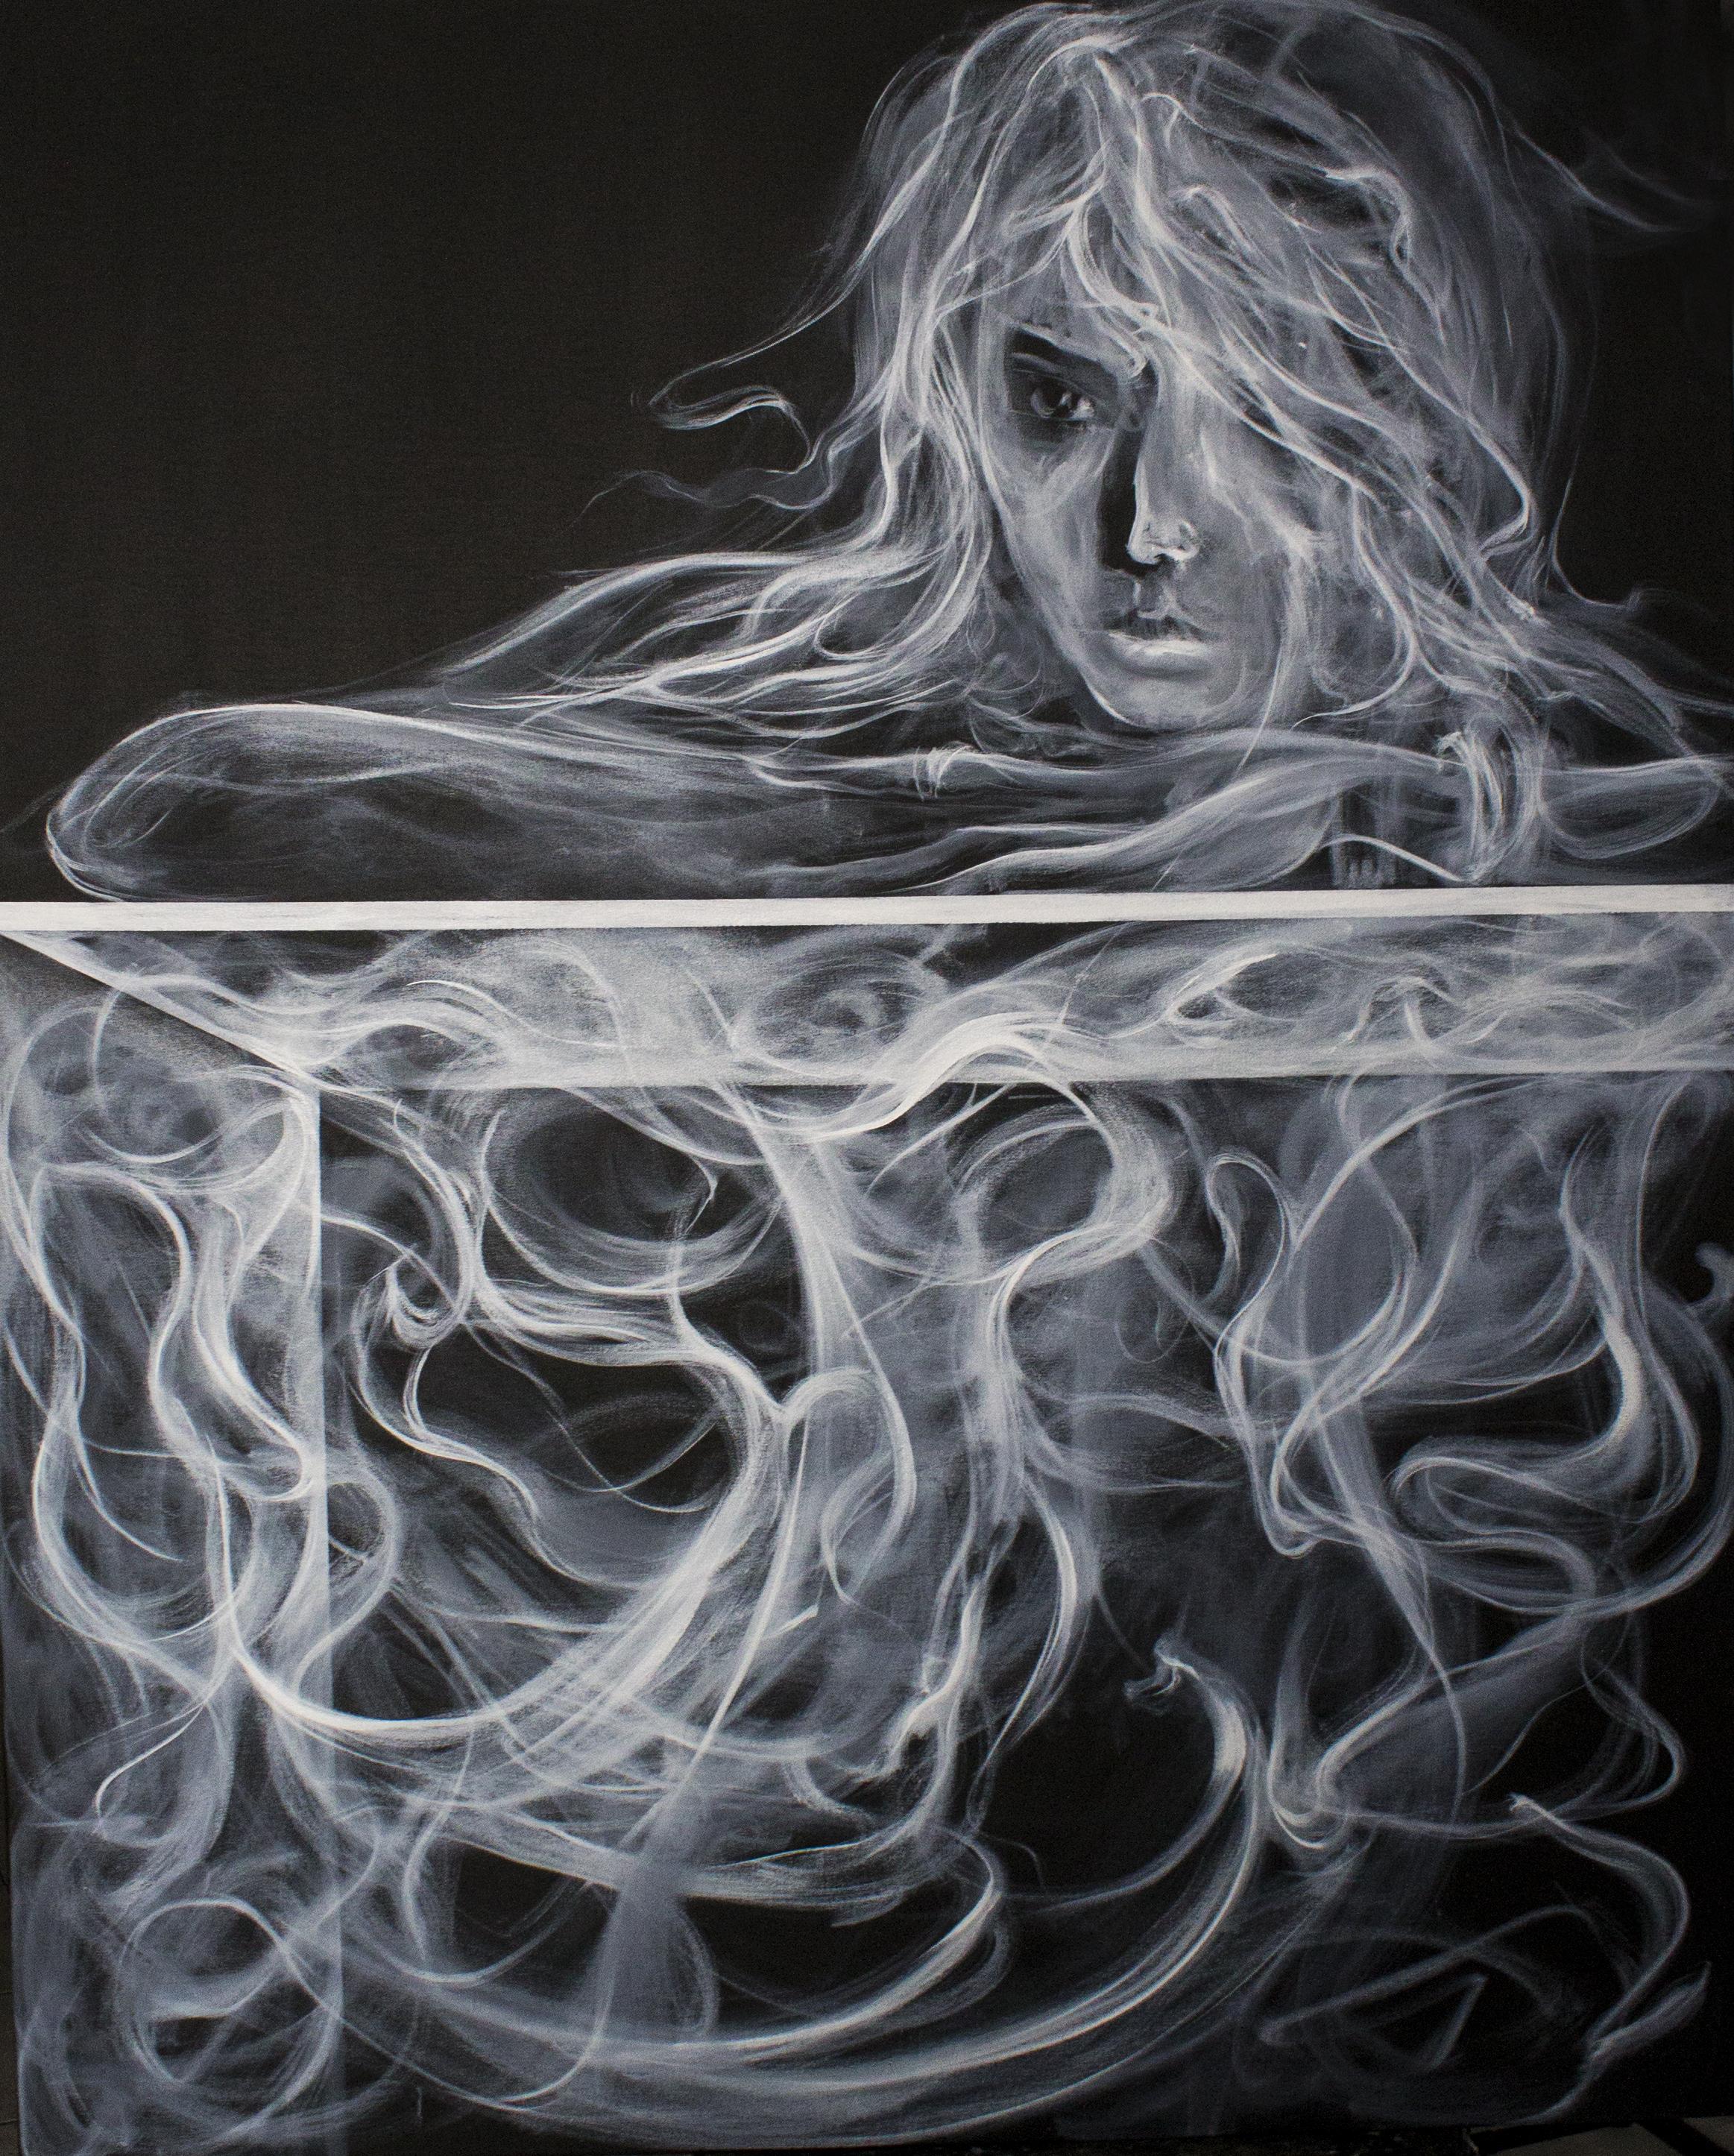 Smoky girl- Mher Khachatryan